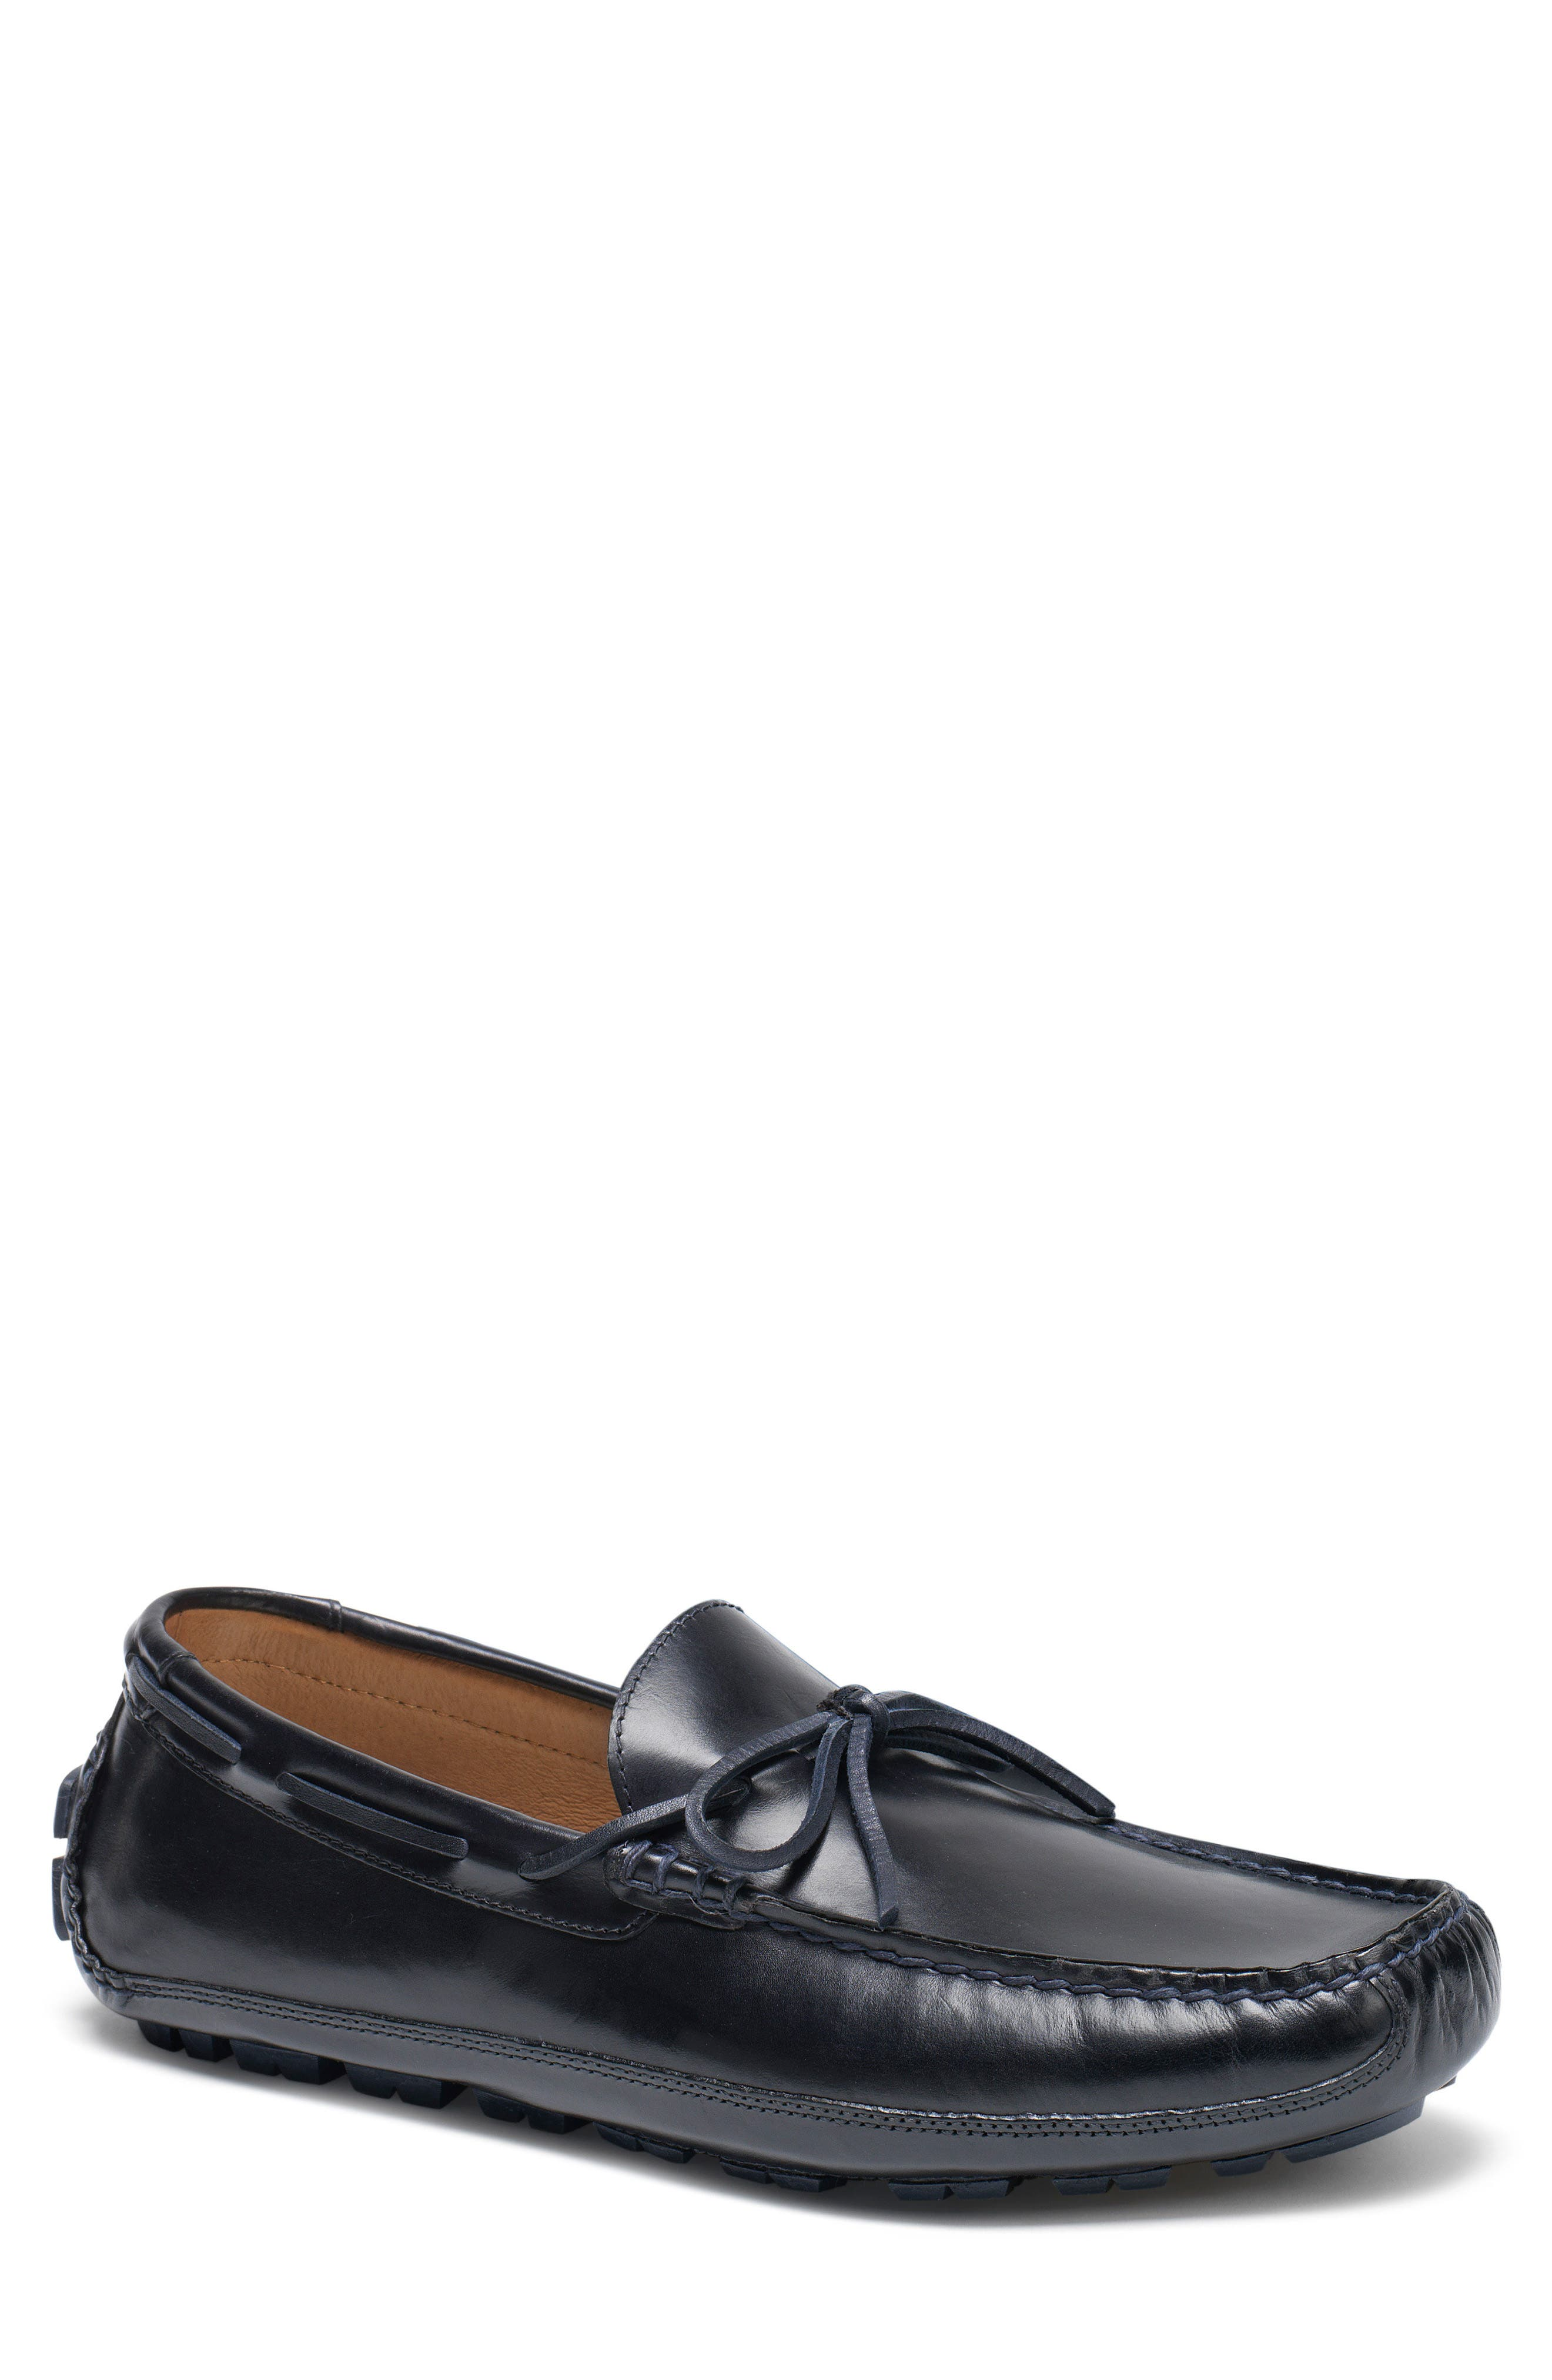 Men's Trask Shoes Sale \u0026 Clearance